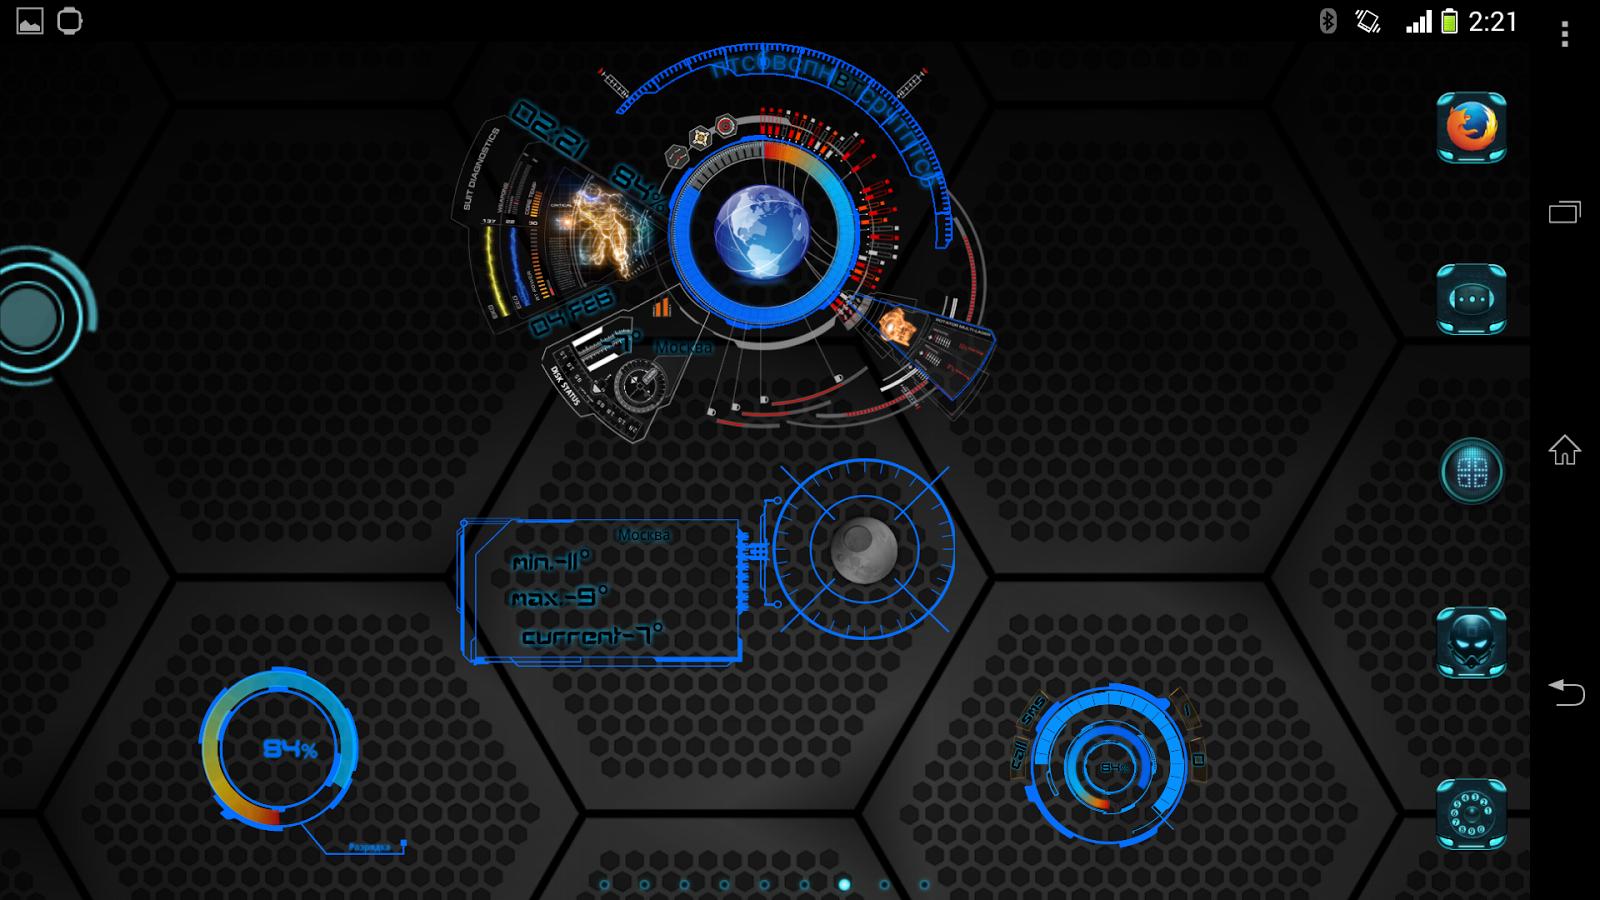 Iron Man Jarvis Wallpaper Android Iron Man Jarvis Interface